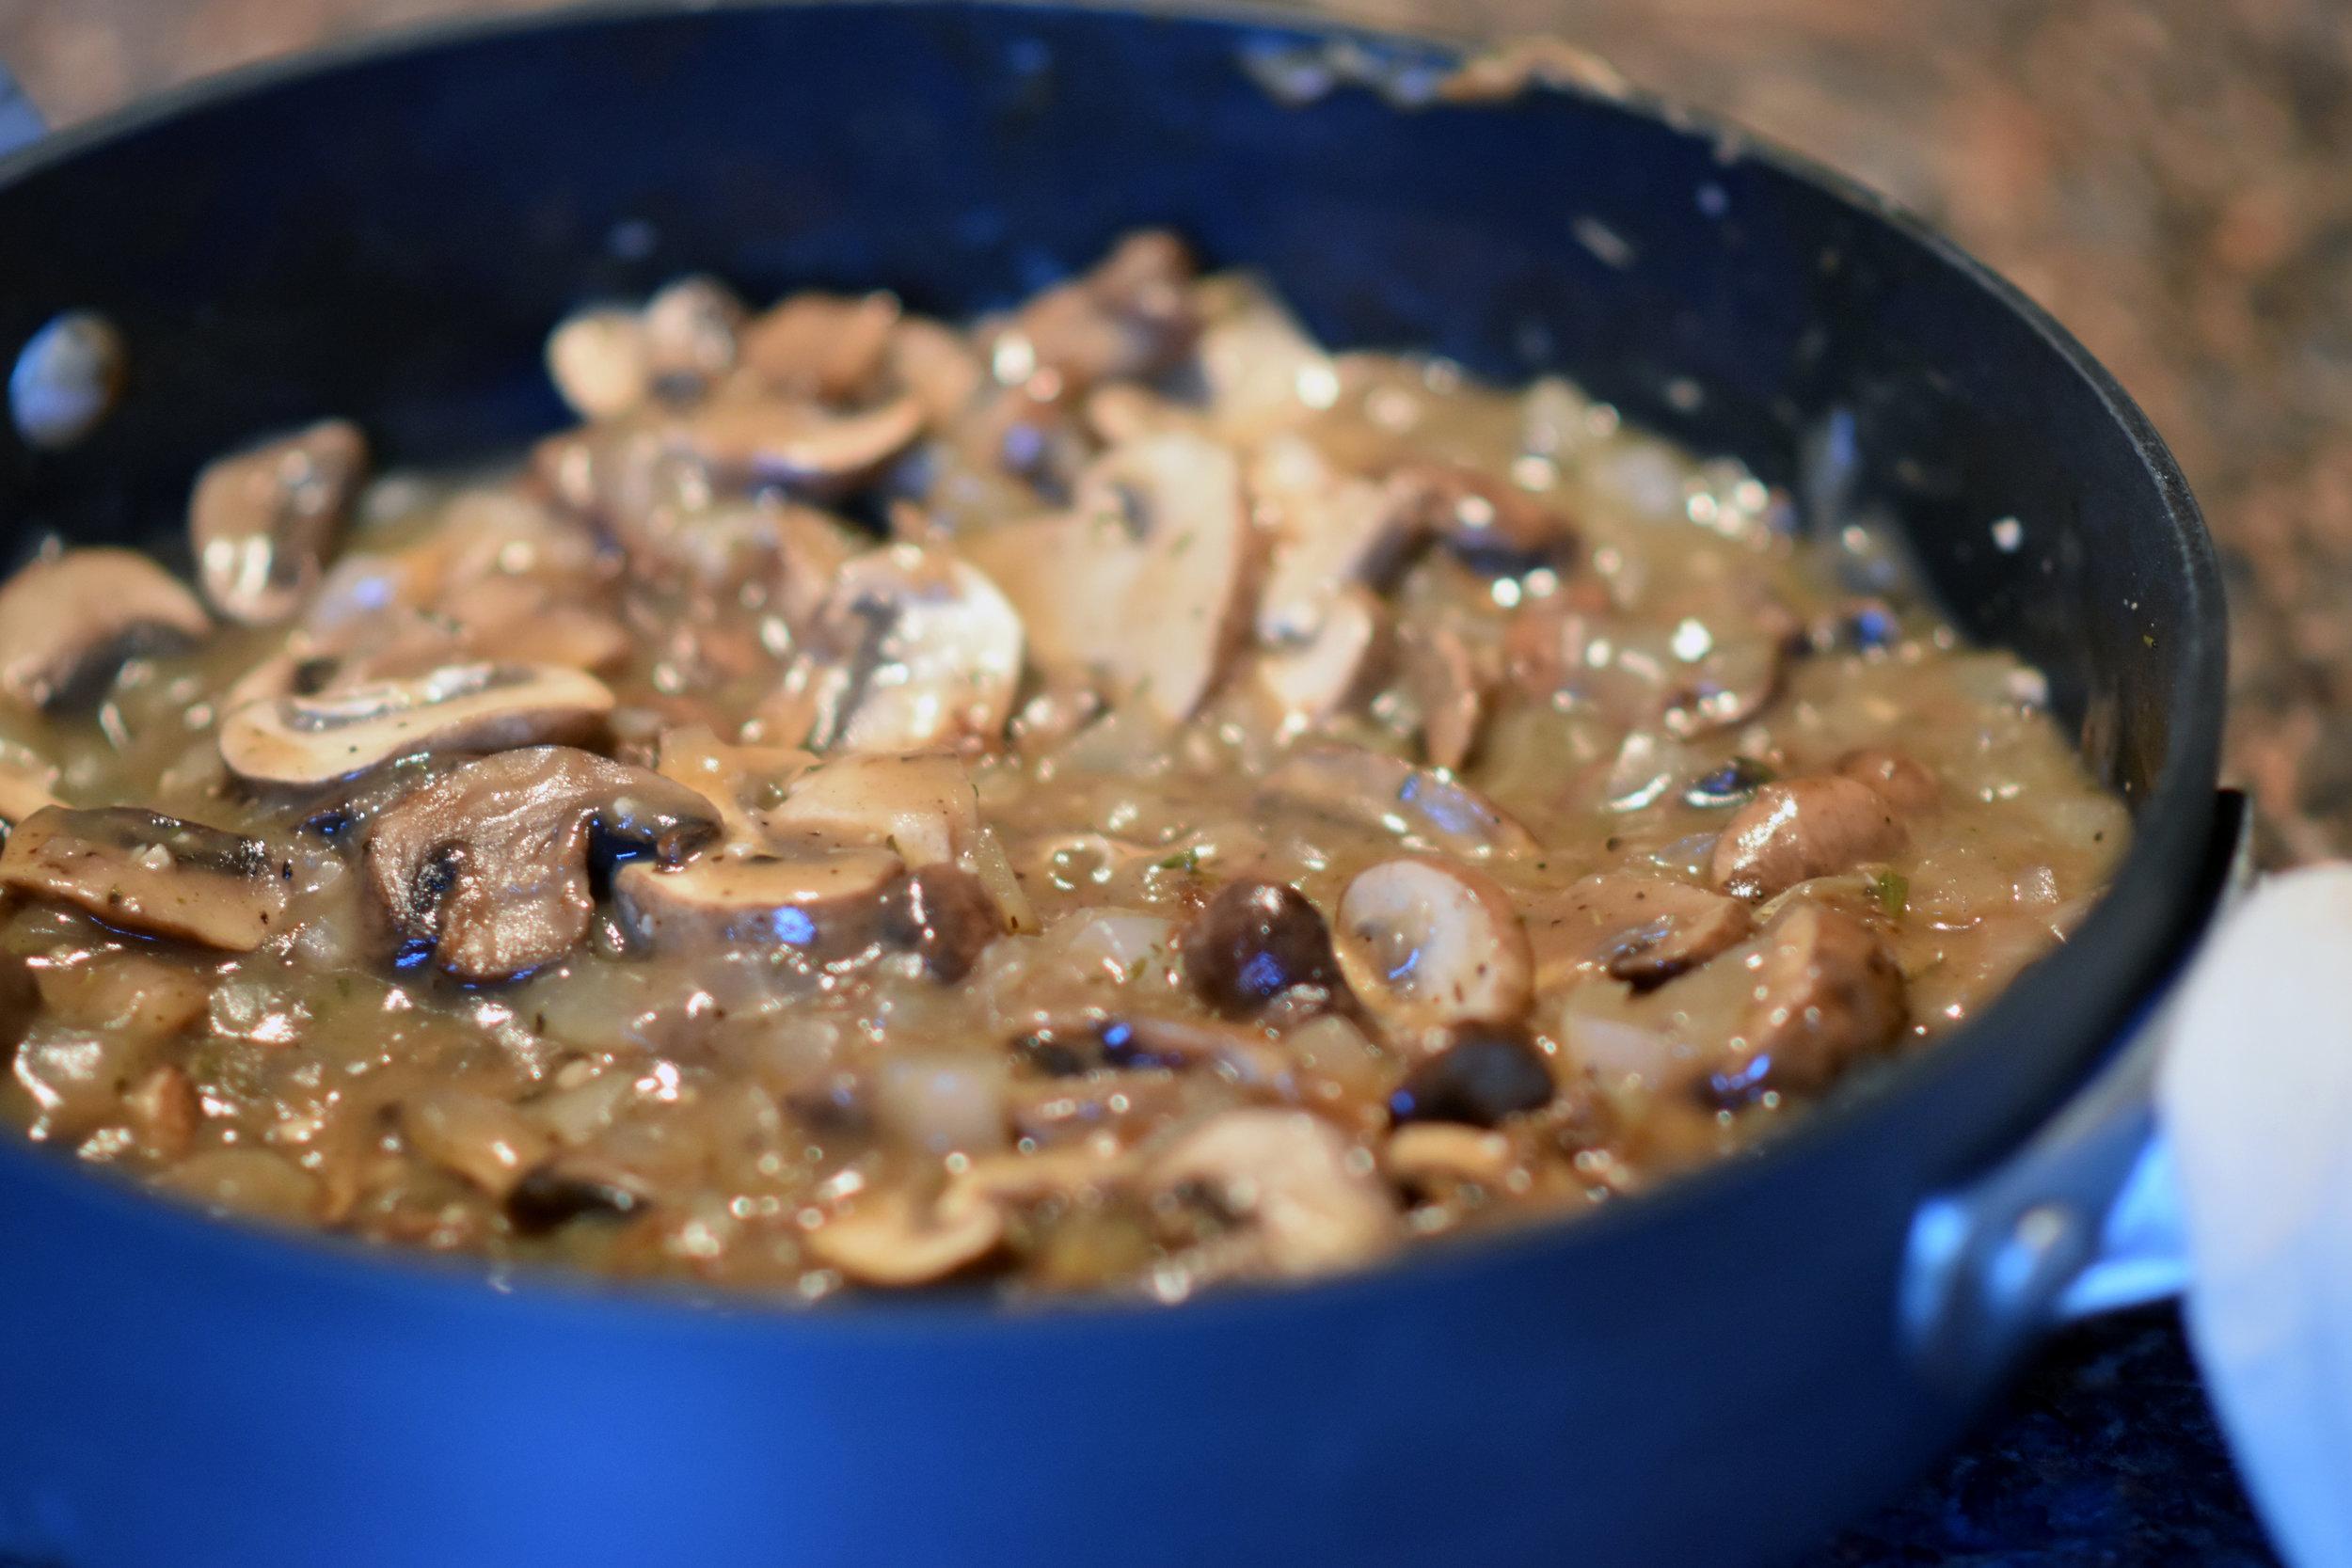 good vegan gravy - instead of sour cream for this not-really-stroganoff